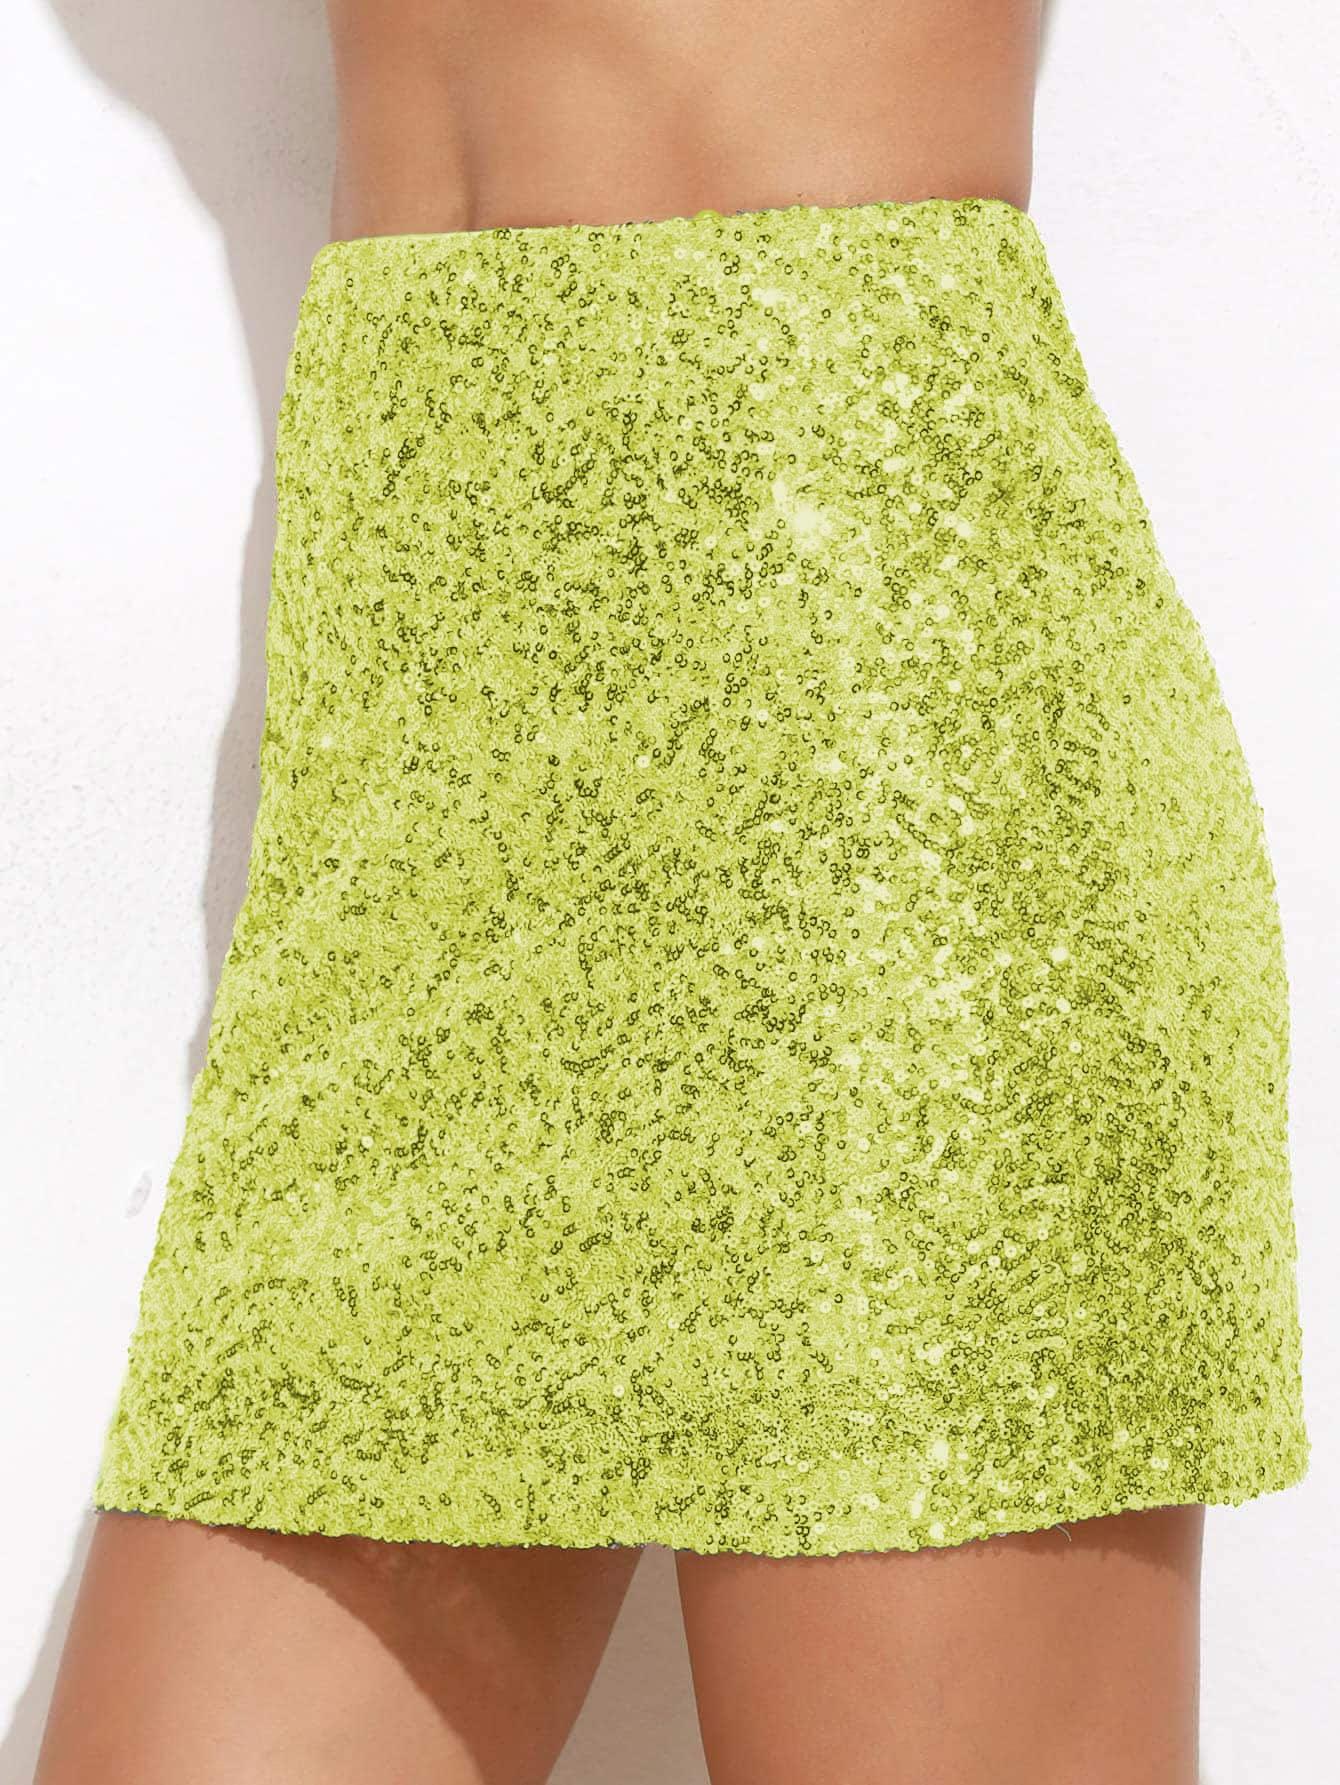 Фото - Неоновая зеленая юбка с блестками от SheIn зеленого цвета